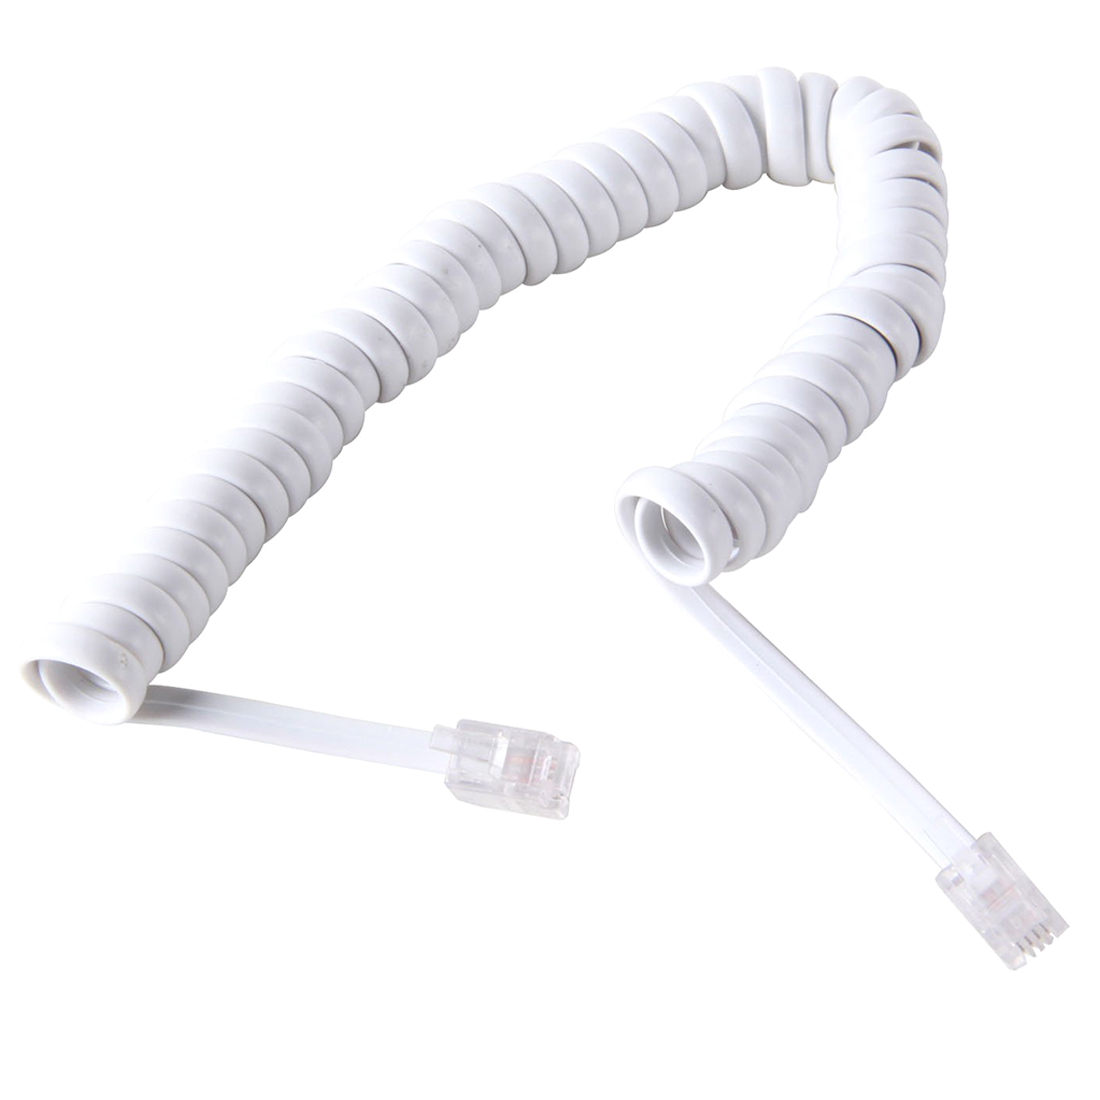 GJ11 handset cord Belt Crystal Wrapped Finish for telephone receiver White